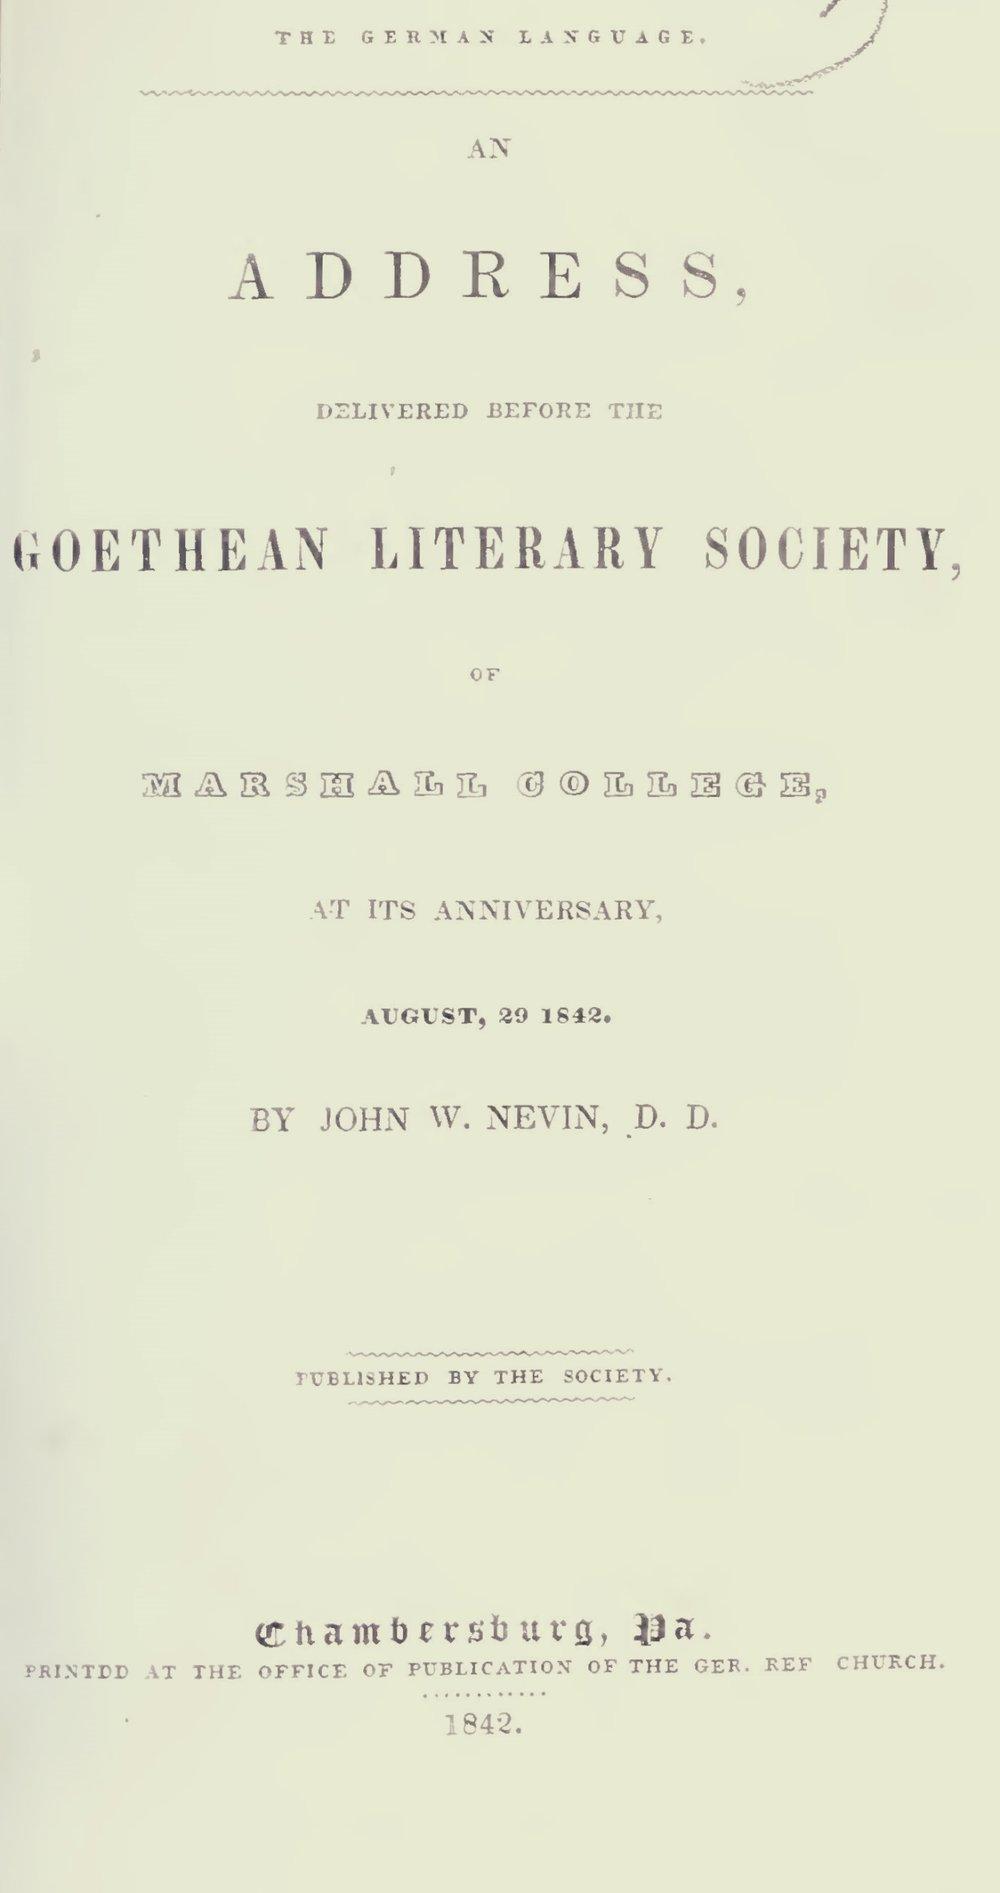 Nevin, John Williamson, The German Language Title Page.jpg